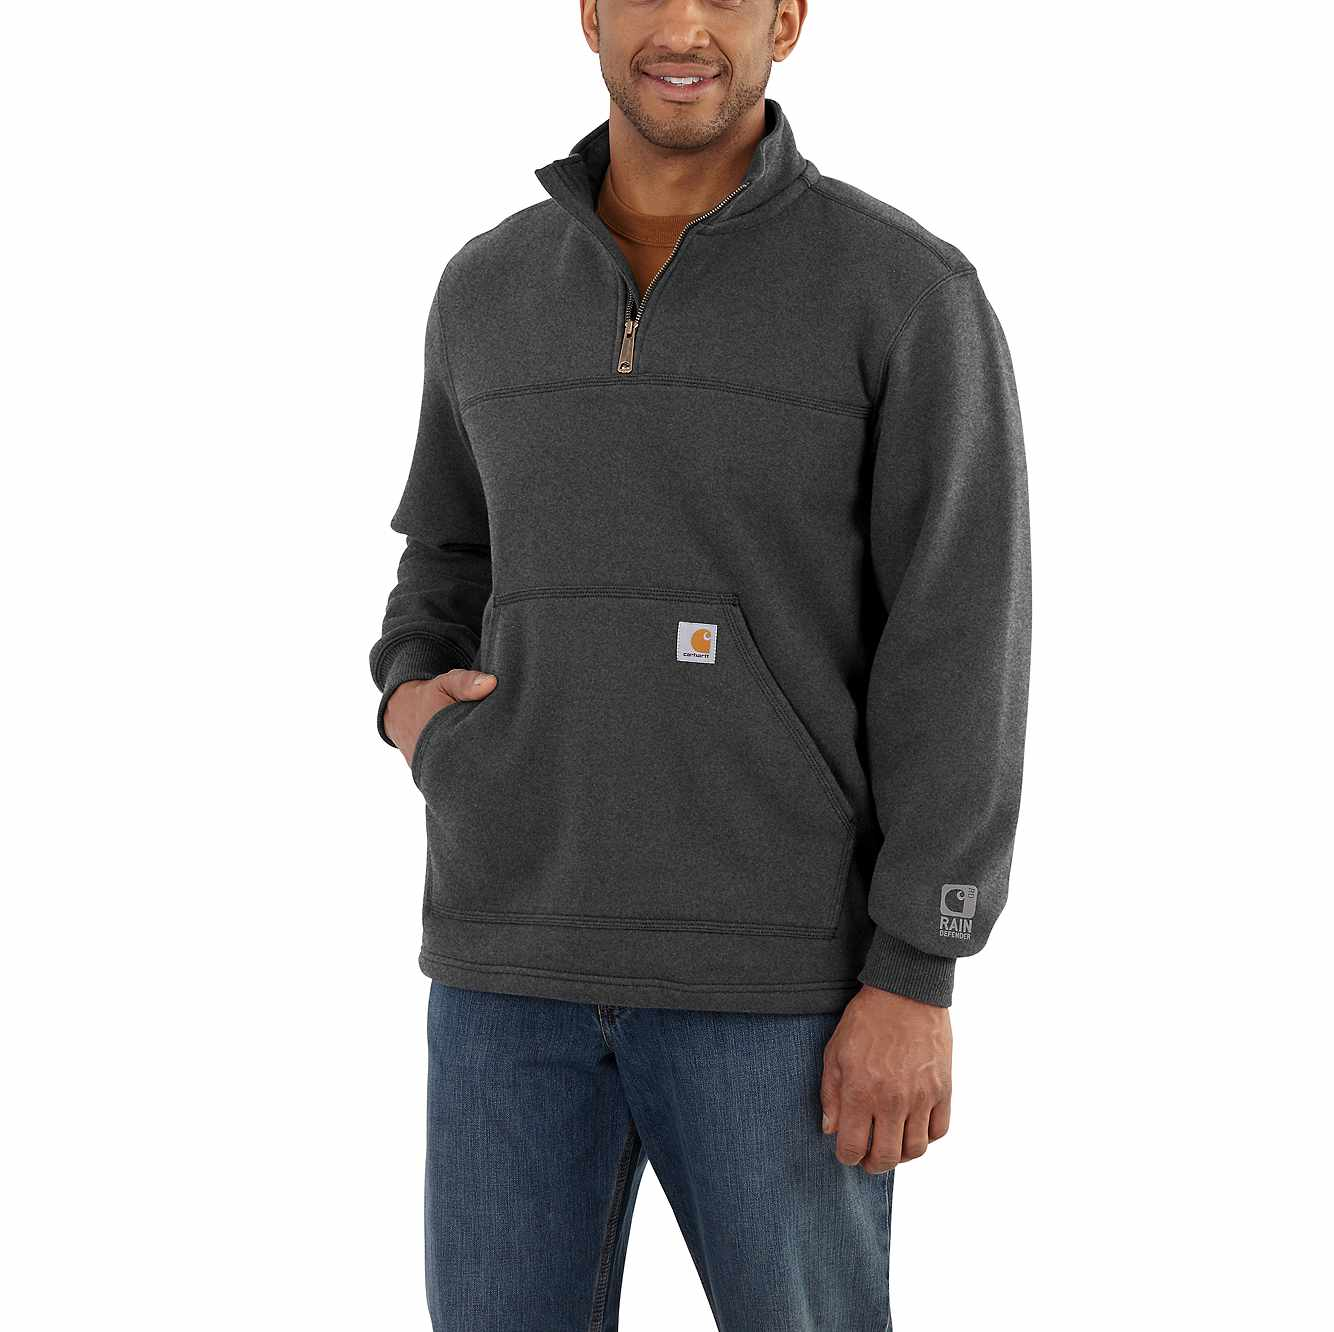 Carhartt Men/'s Rain Defender Paxton Heavyweight Hooded Sweatshirt Large,...